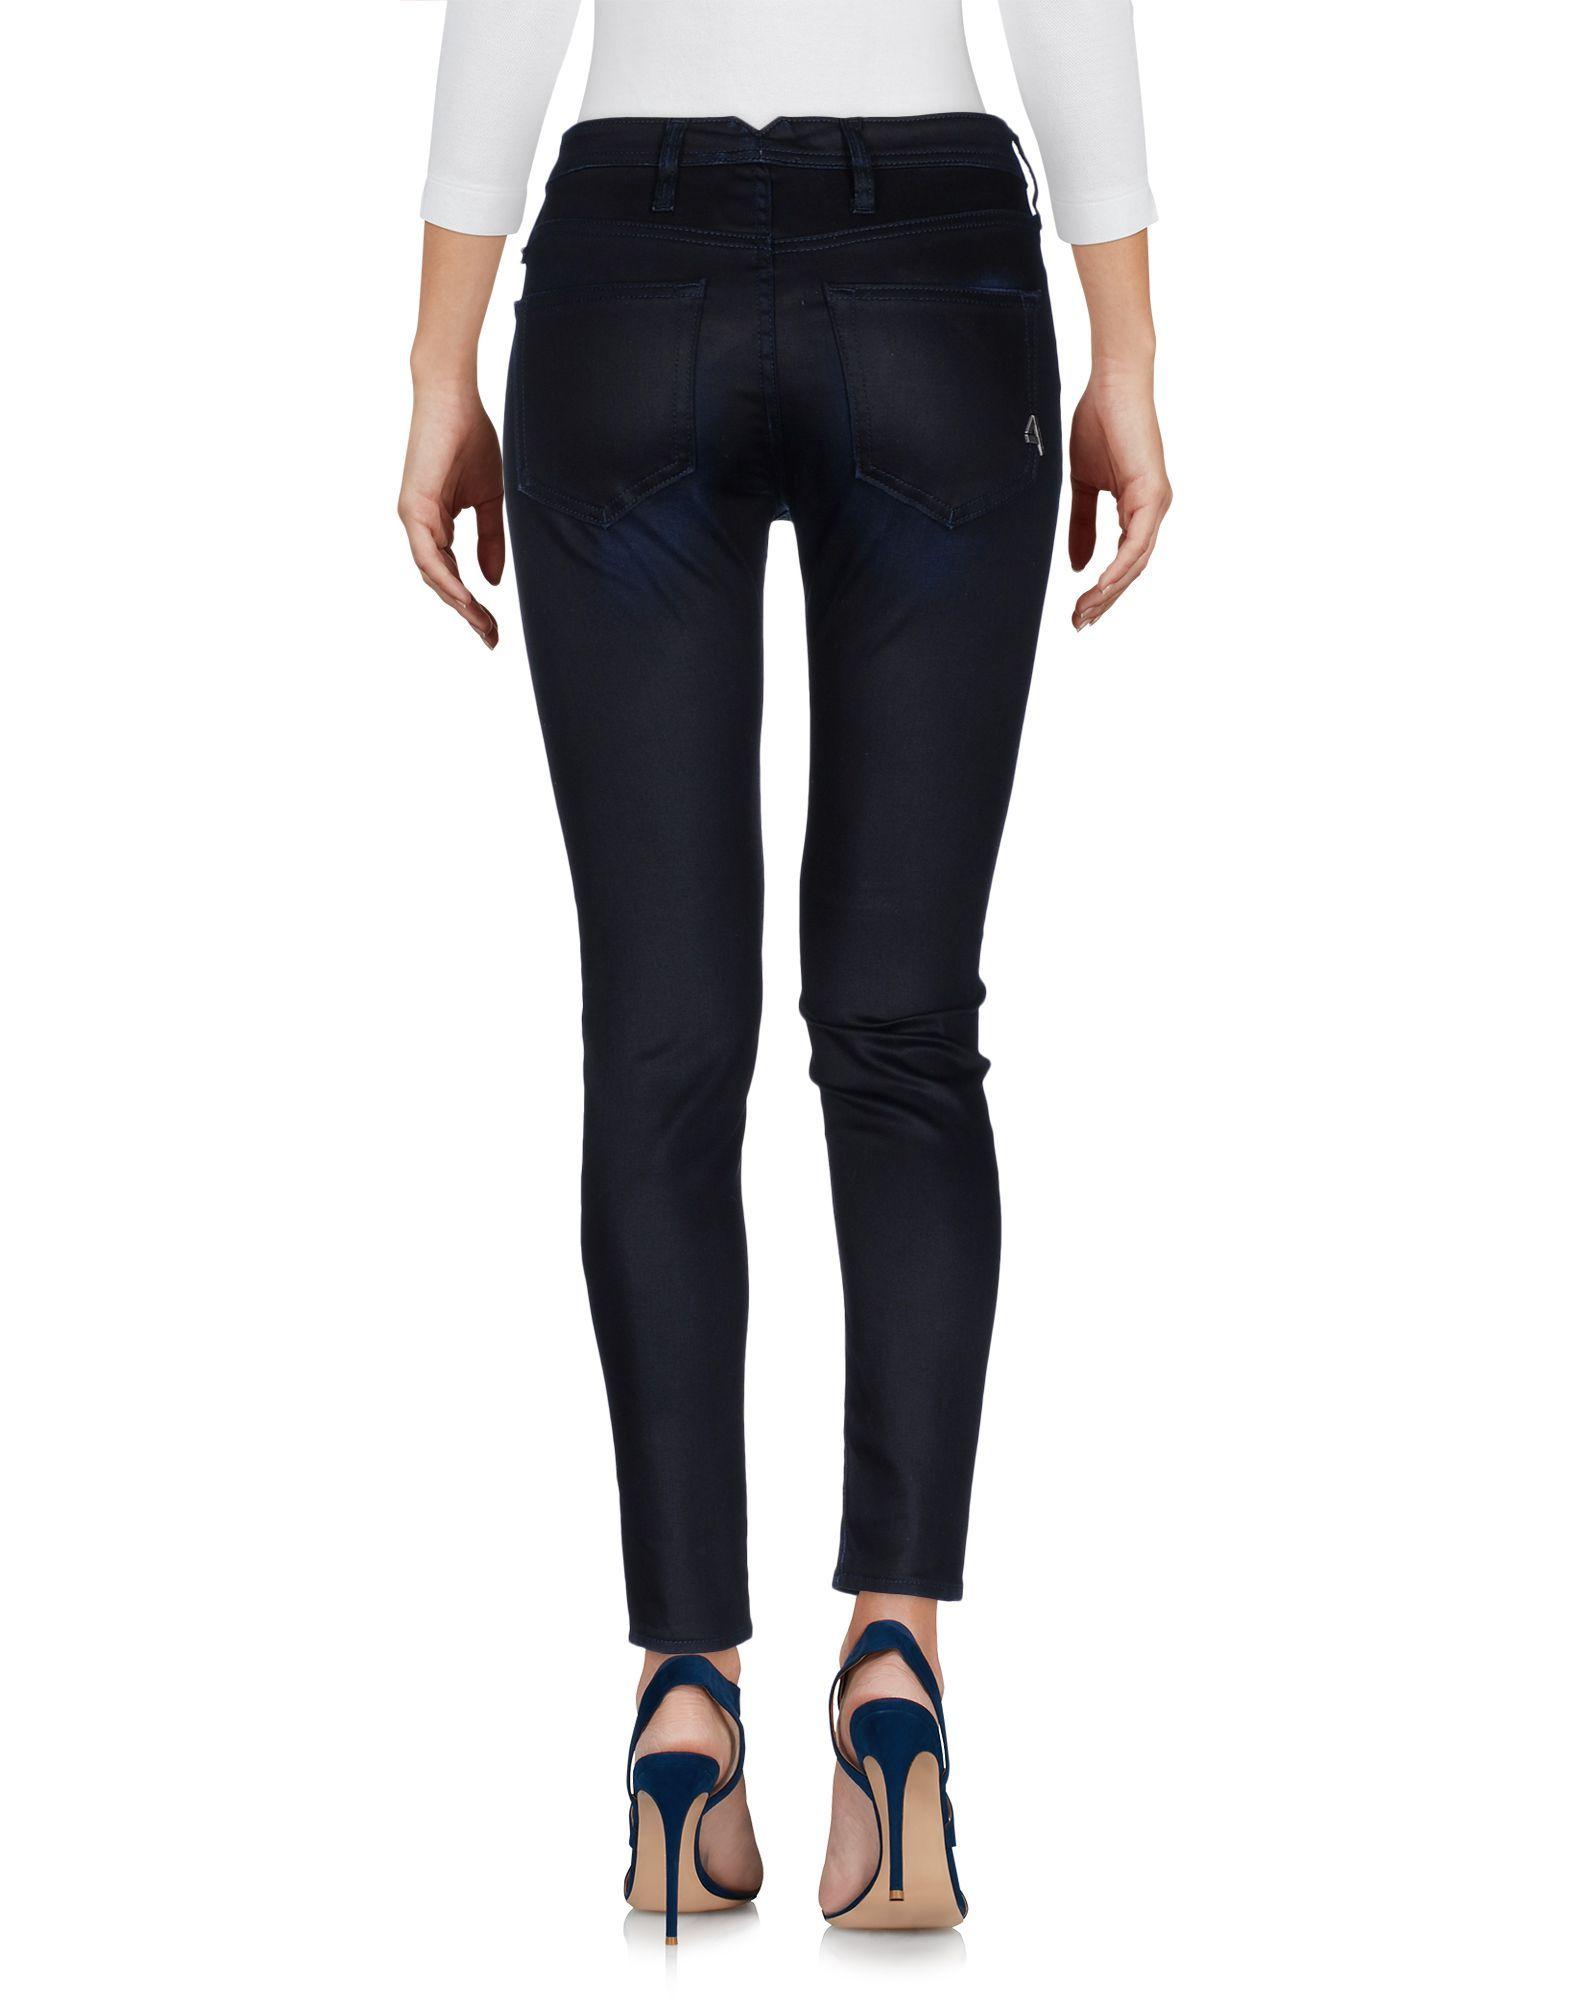 Cycle Blue Cotton Dark Wash Slim Fit Jeans